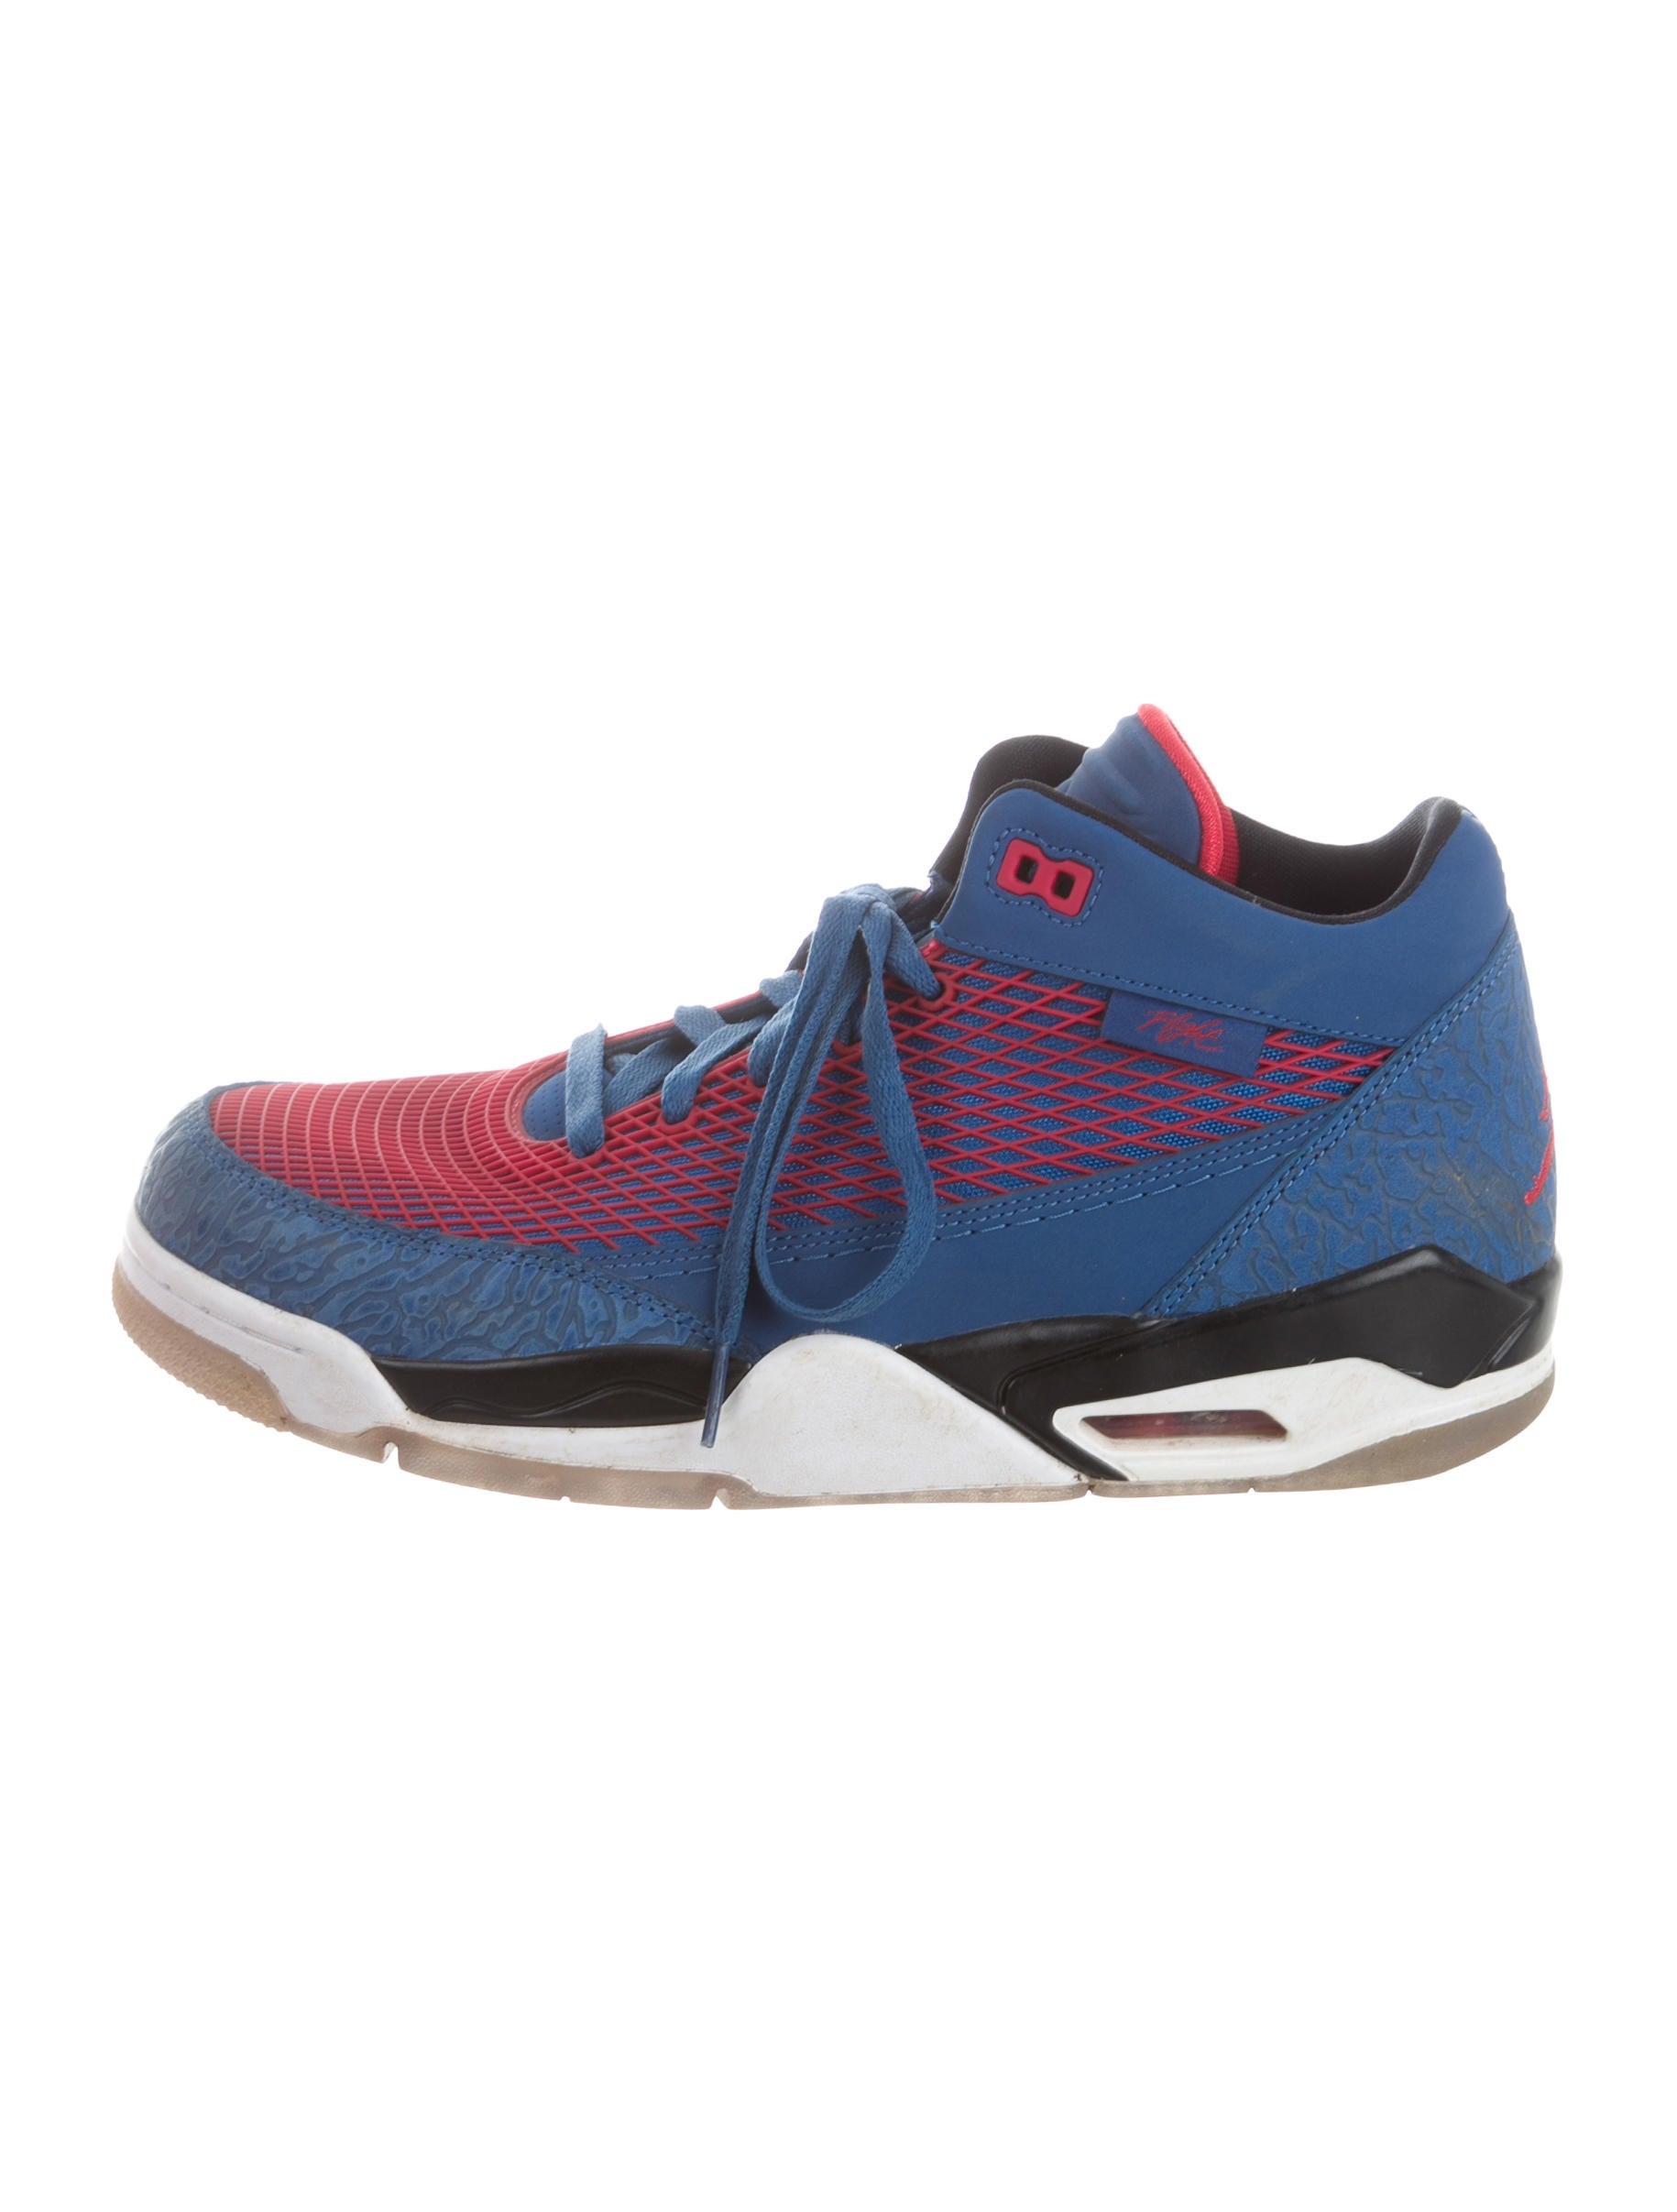 nike air flight club 80 sneakers shoes